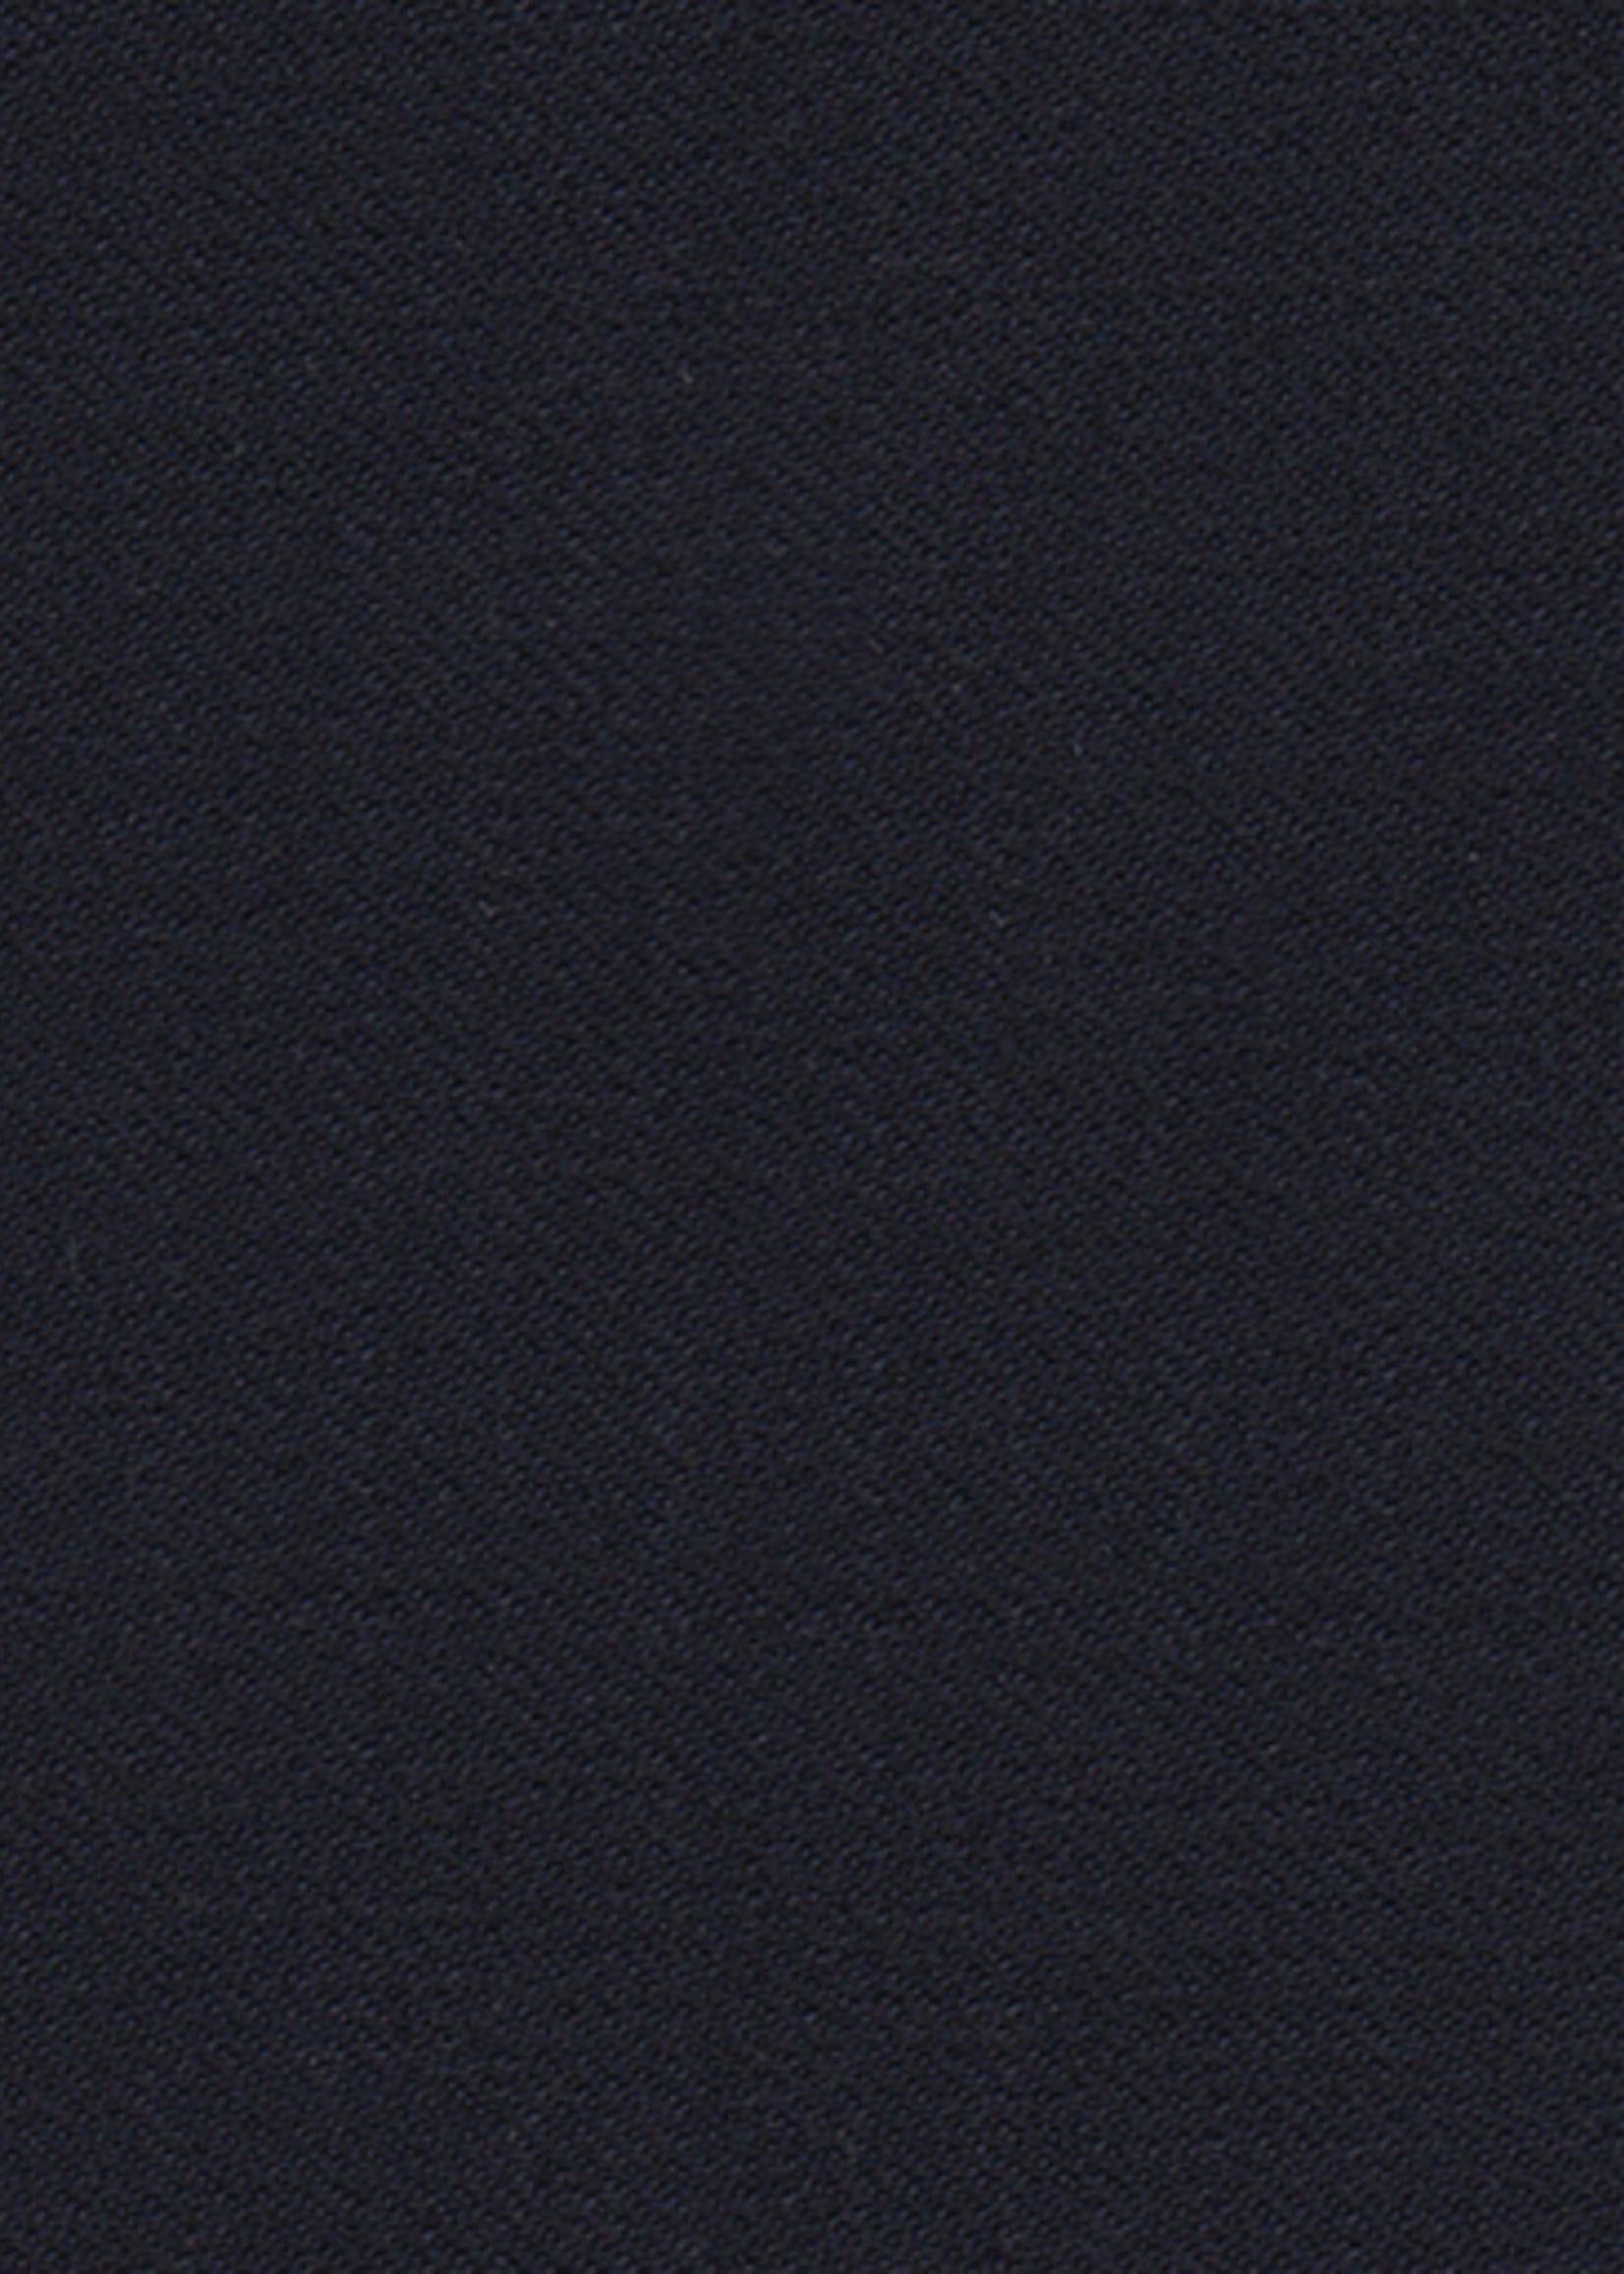 Samuelsohn Samuelsohn Colombo 150's Ice Wool Suit Navy